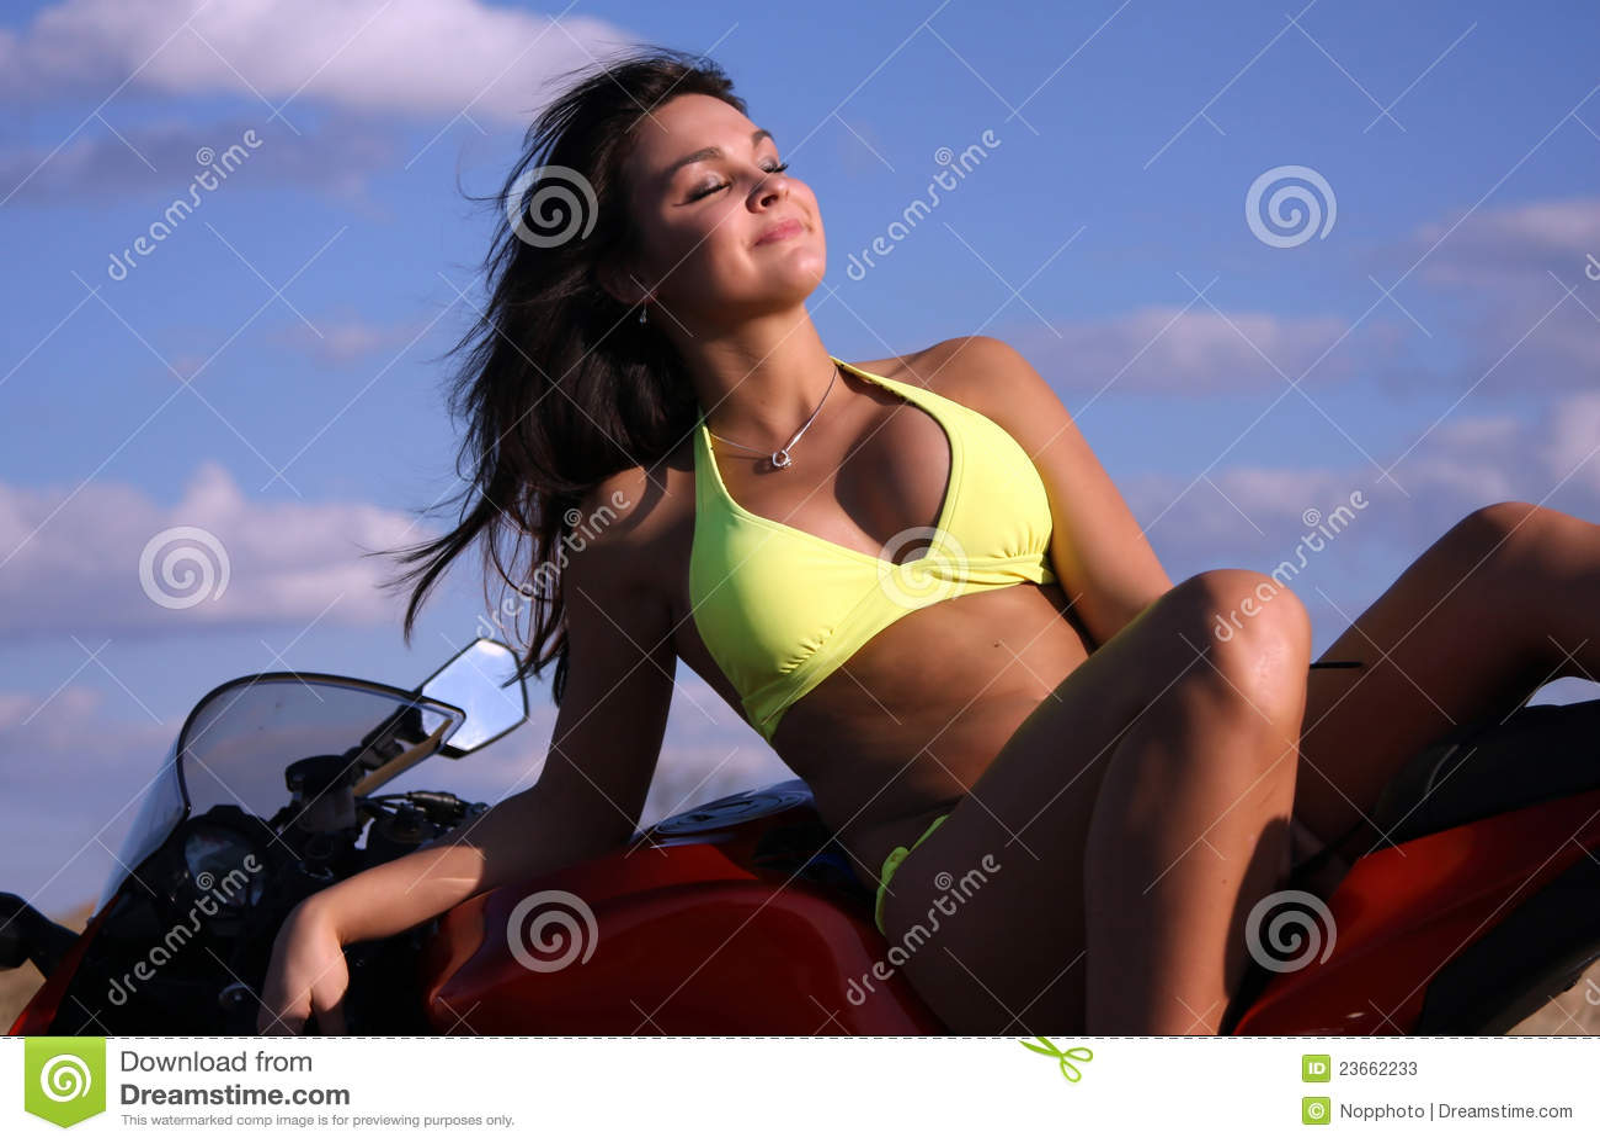 Девушки в мини бикини с мотоциклами скачать бесплатно фото 551-938